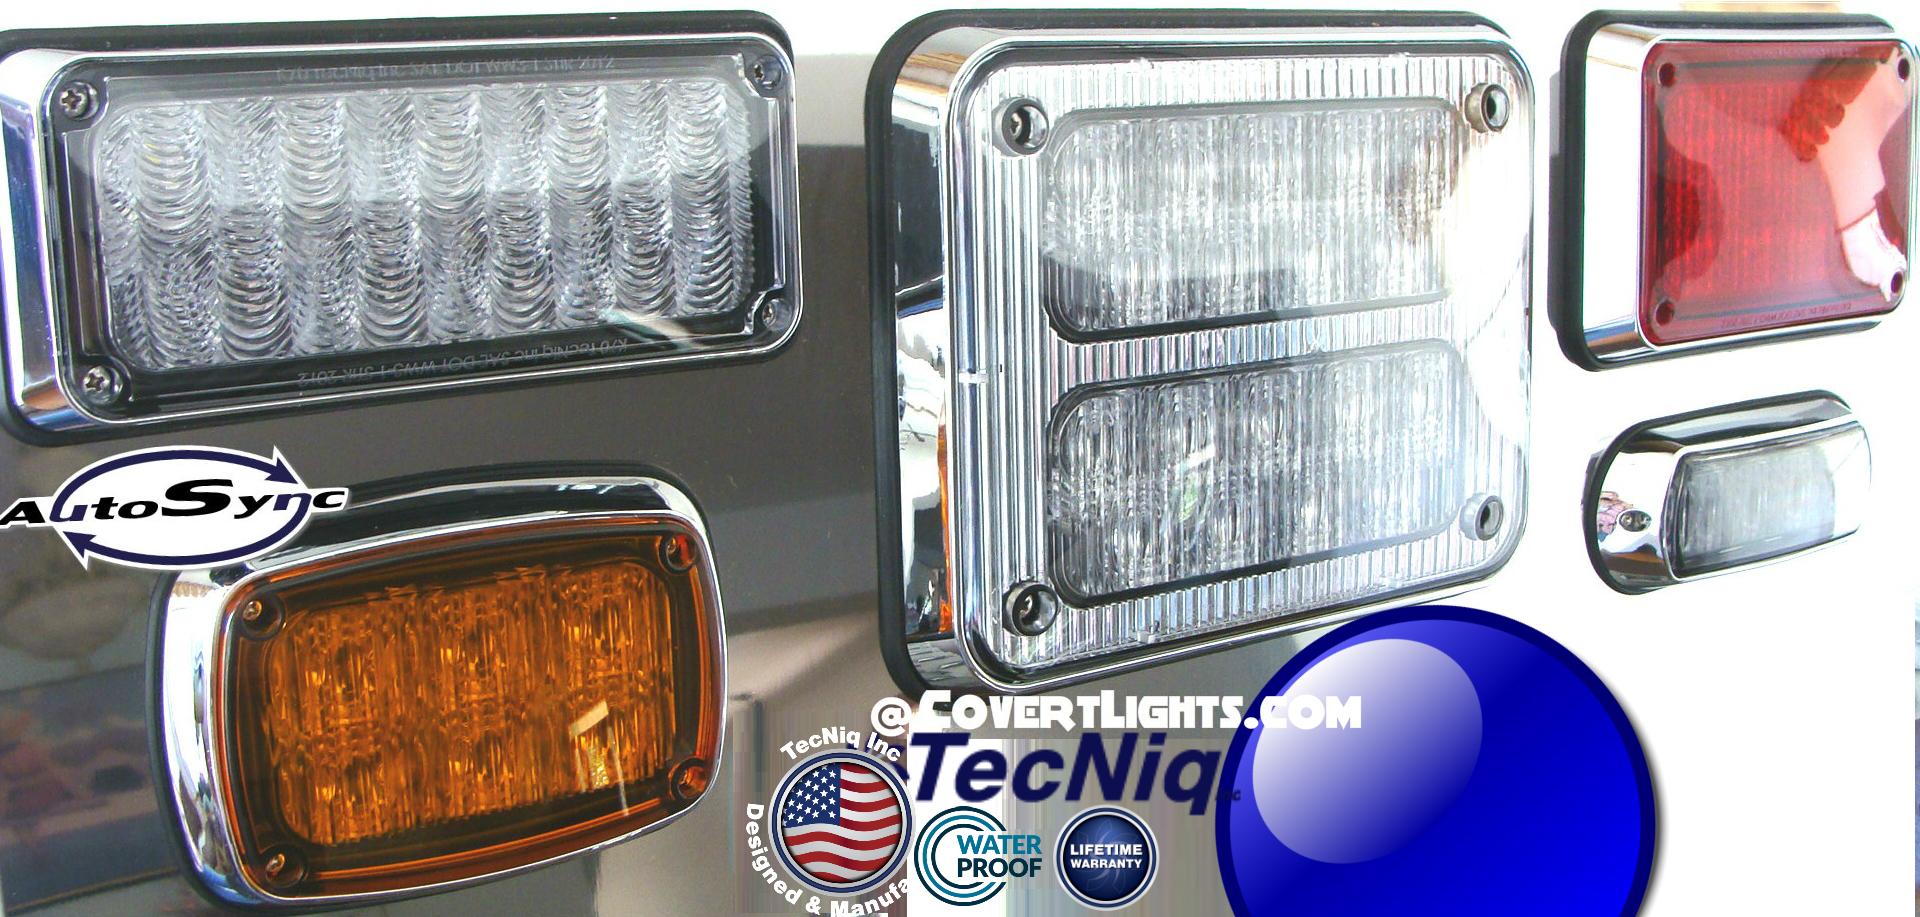 tecniq-master-covert-lights.jpg